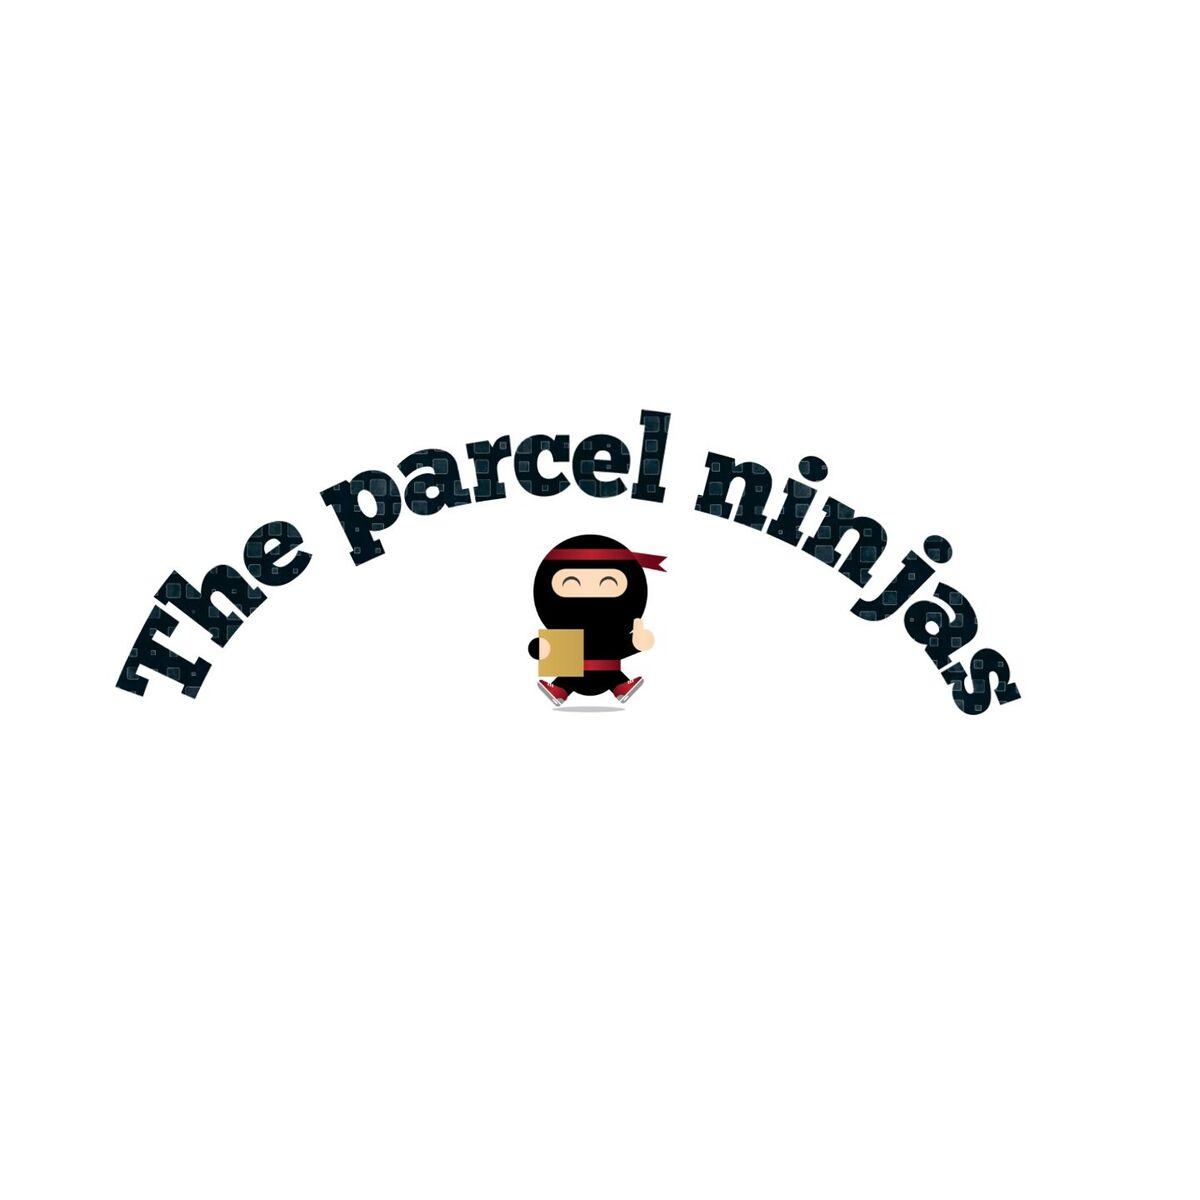 the-parcel-ninjas